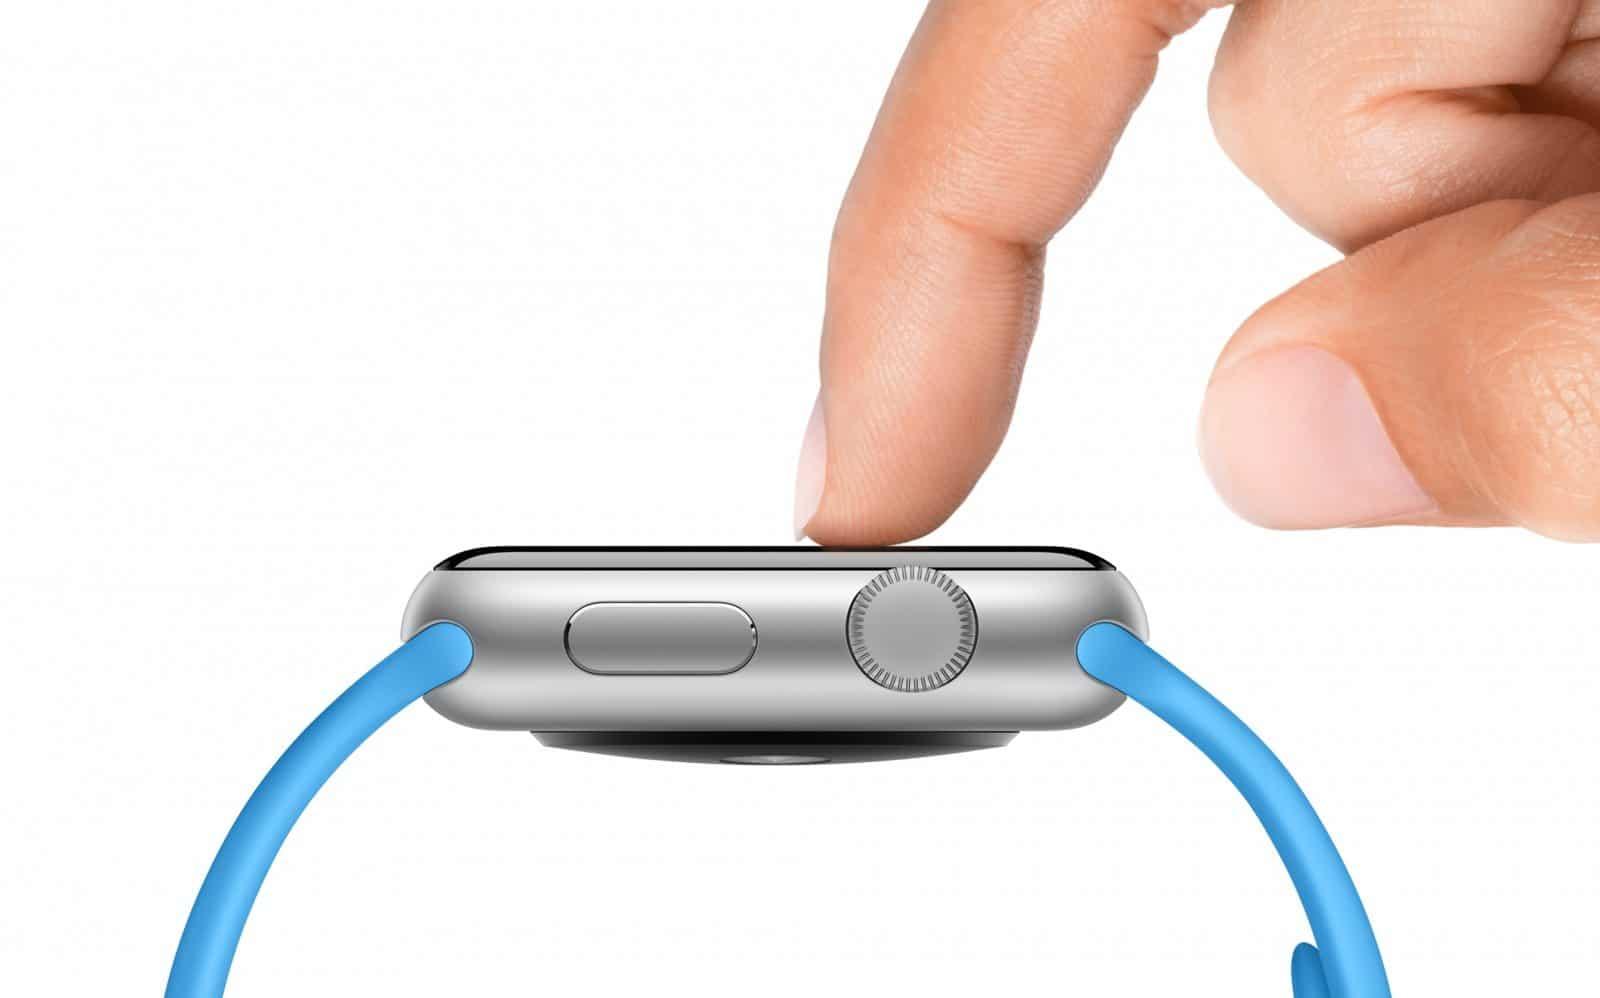 The key smartwatch battleground? It should be battery life.